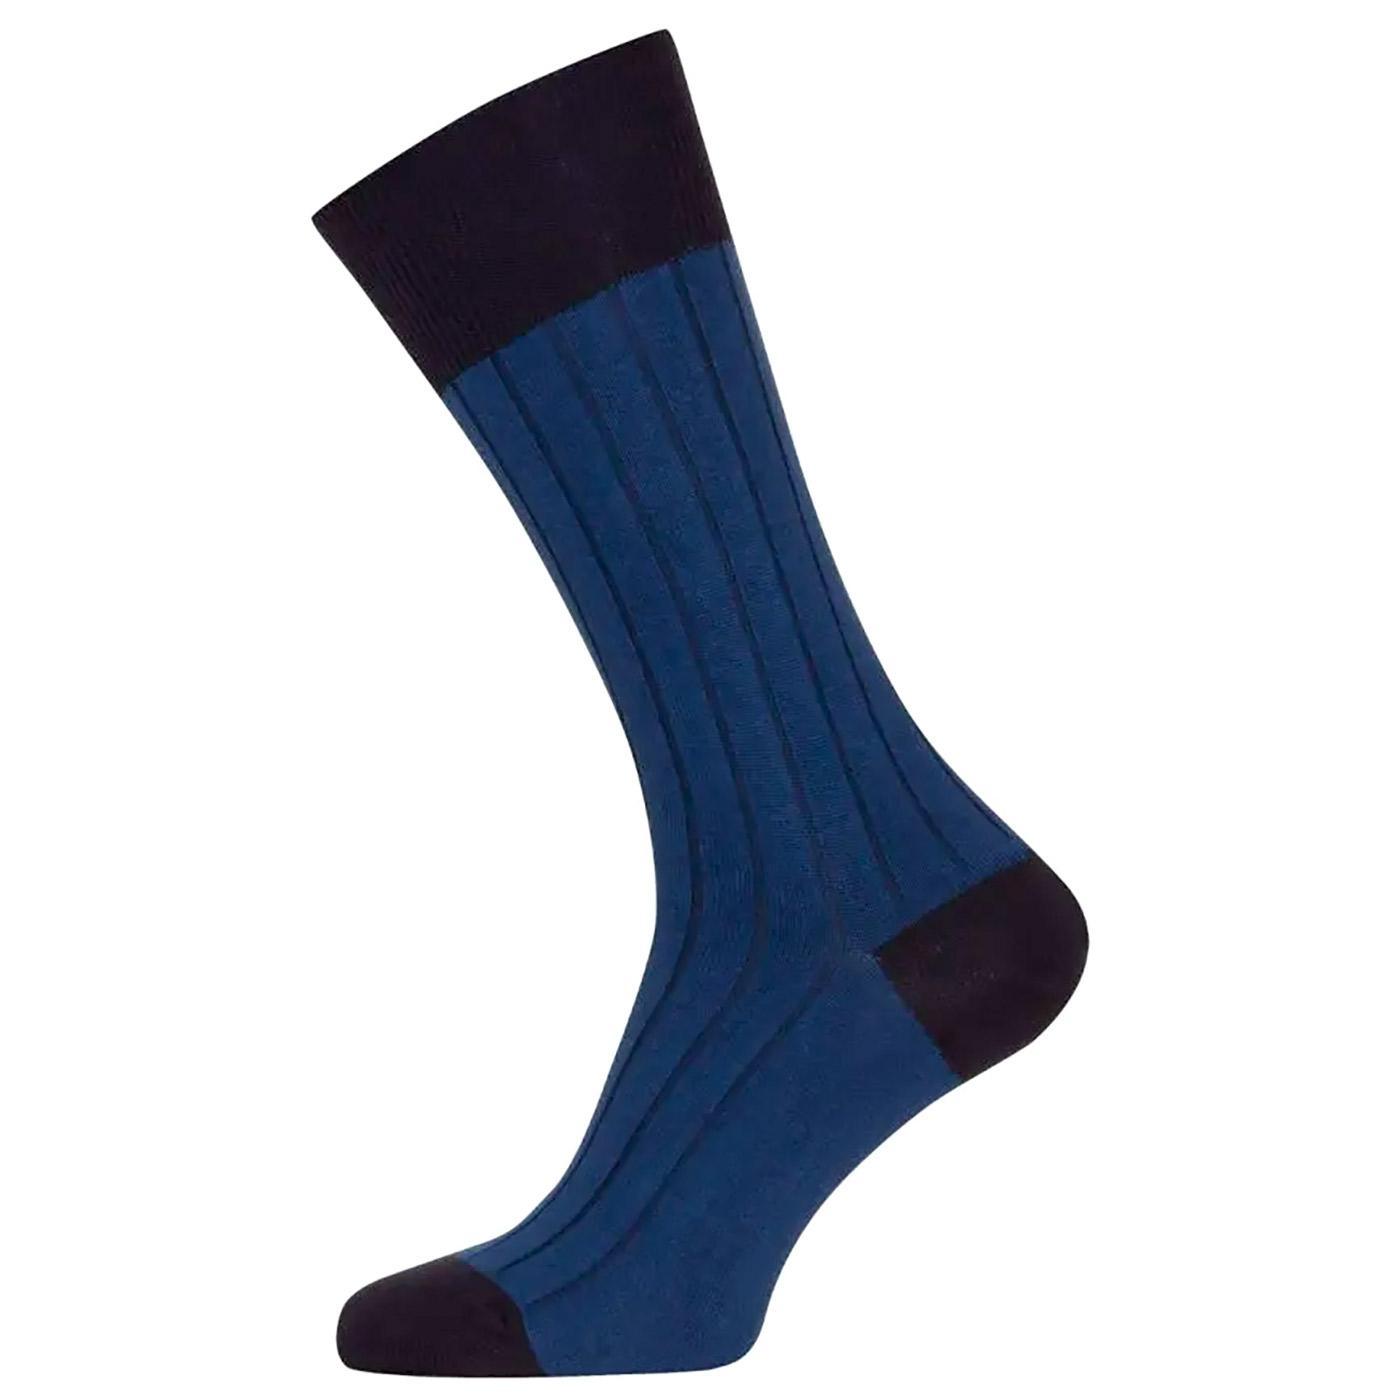 Gamma JOHN SMEDLEY Colour Block Ribbed Socks (I/N)